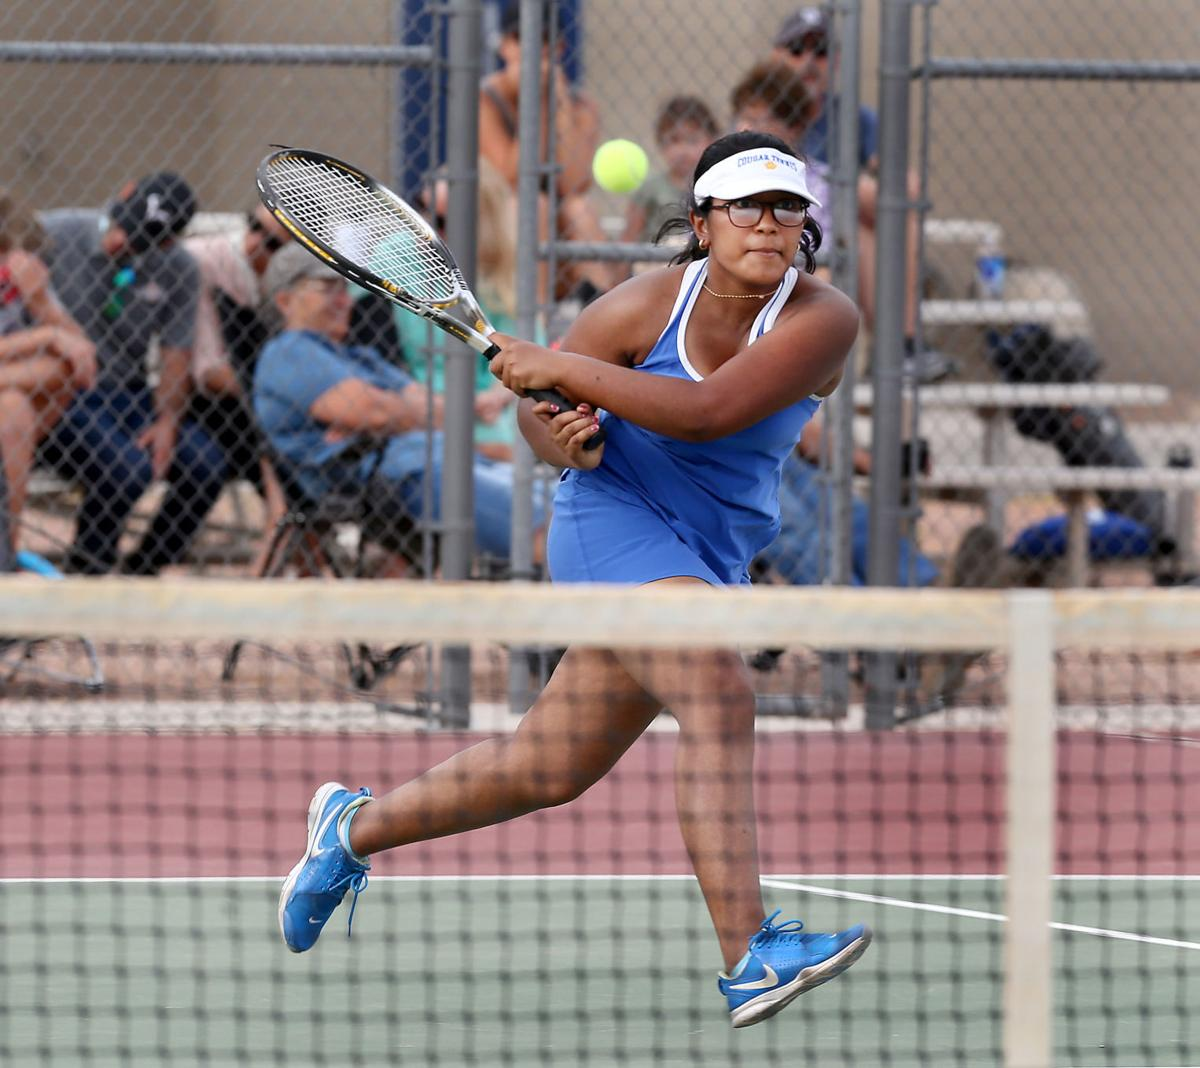 CG Union vs. Vista Grande girls tennis 4/14/21